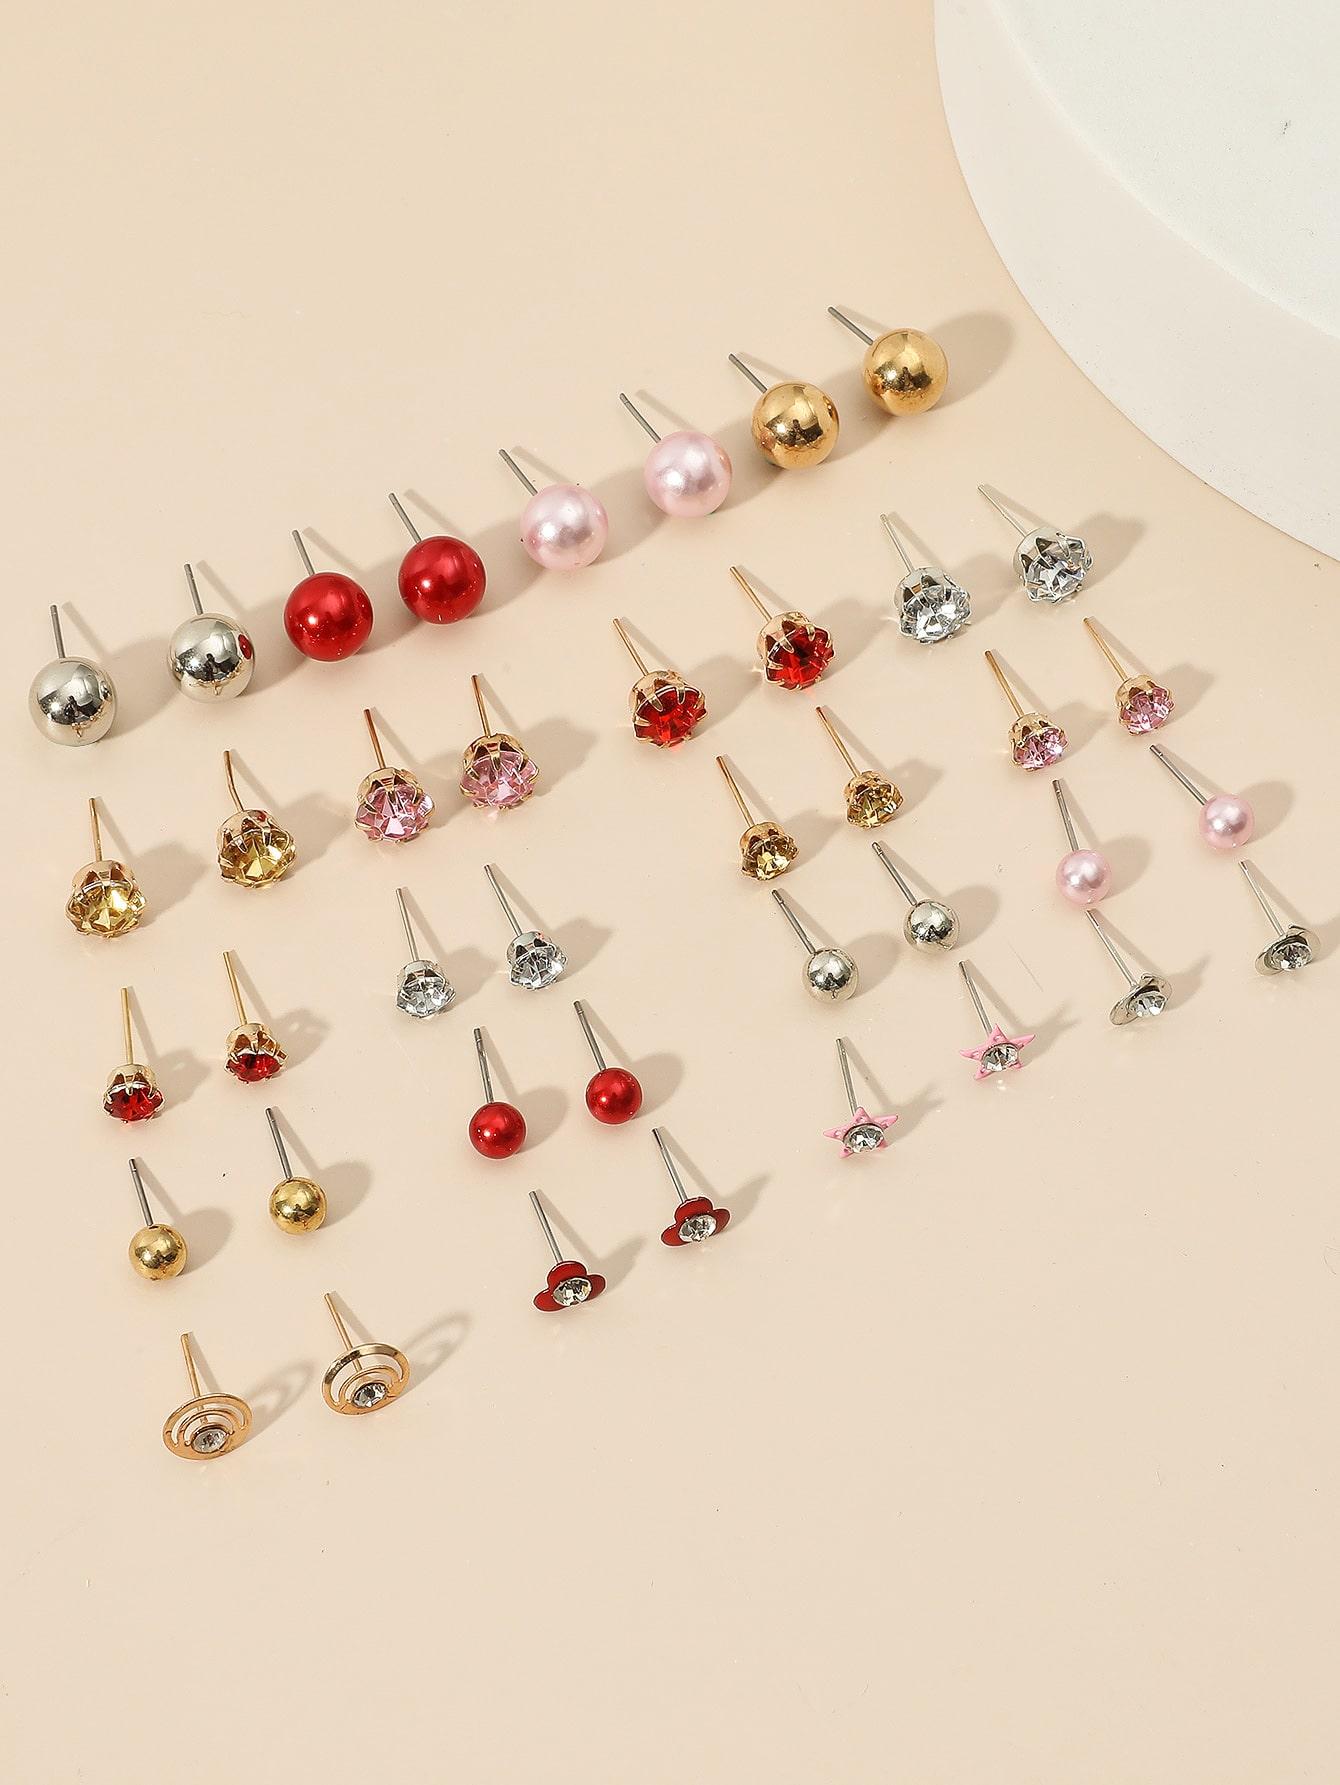 20pairs Rhinestone & Faux Pearl Decor Stud Earrings thumbnail